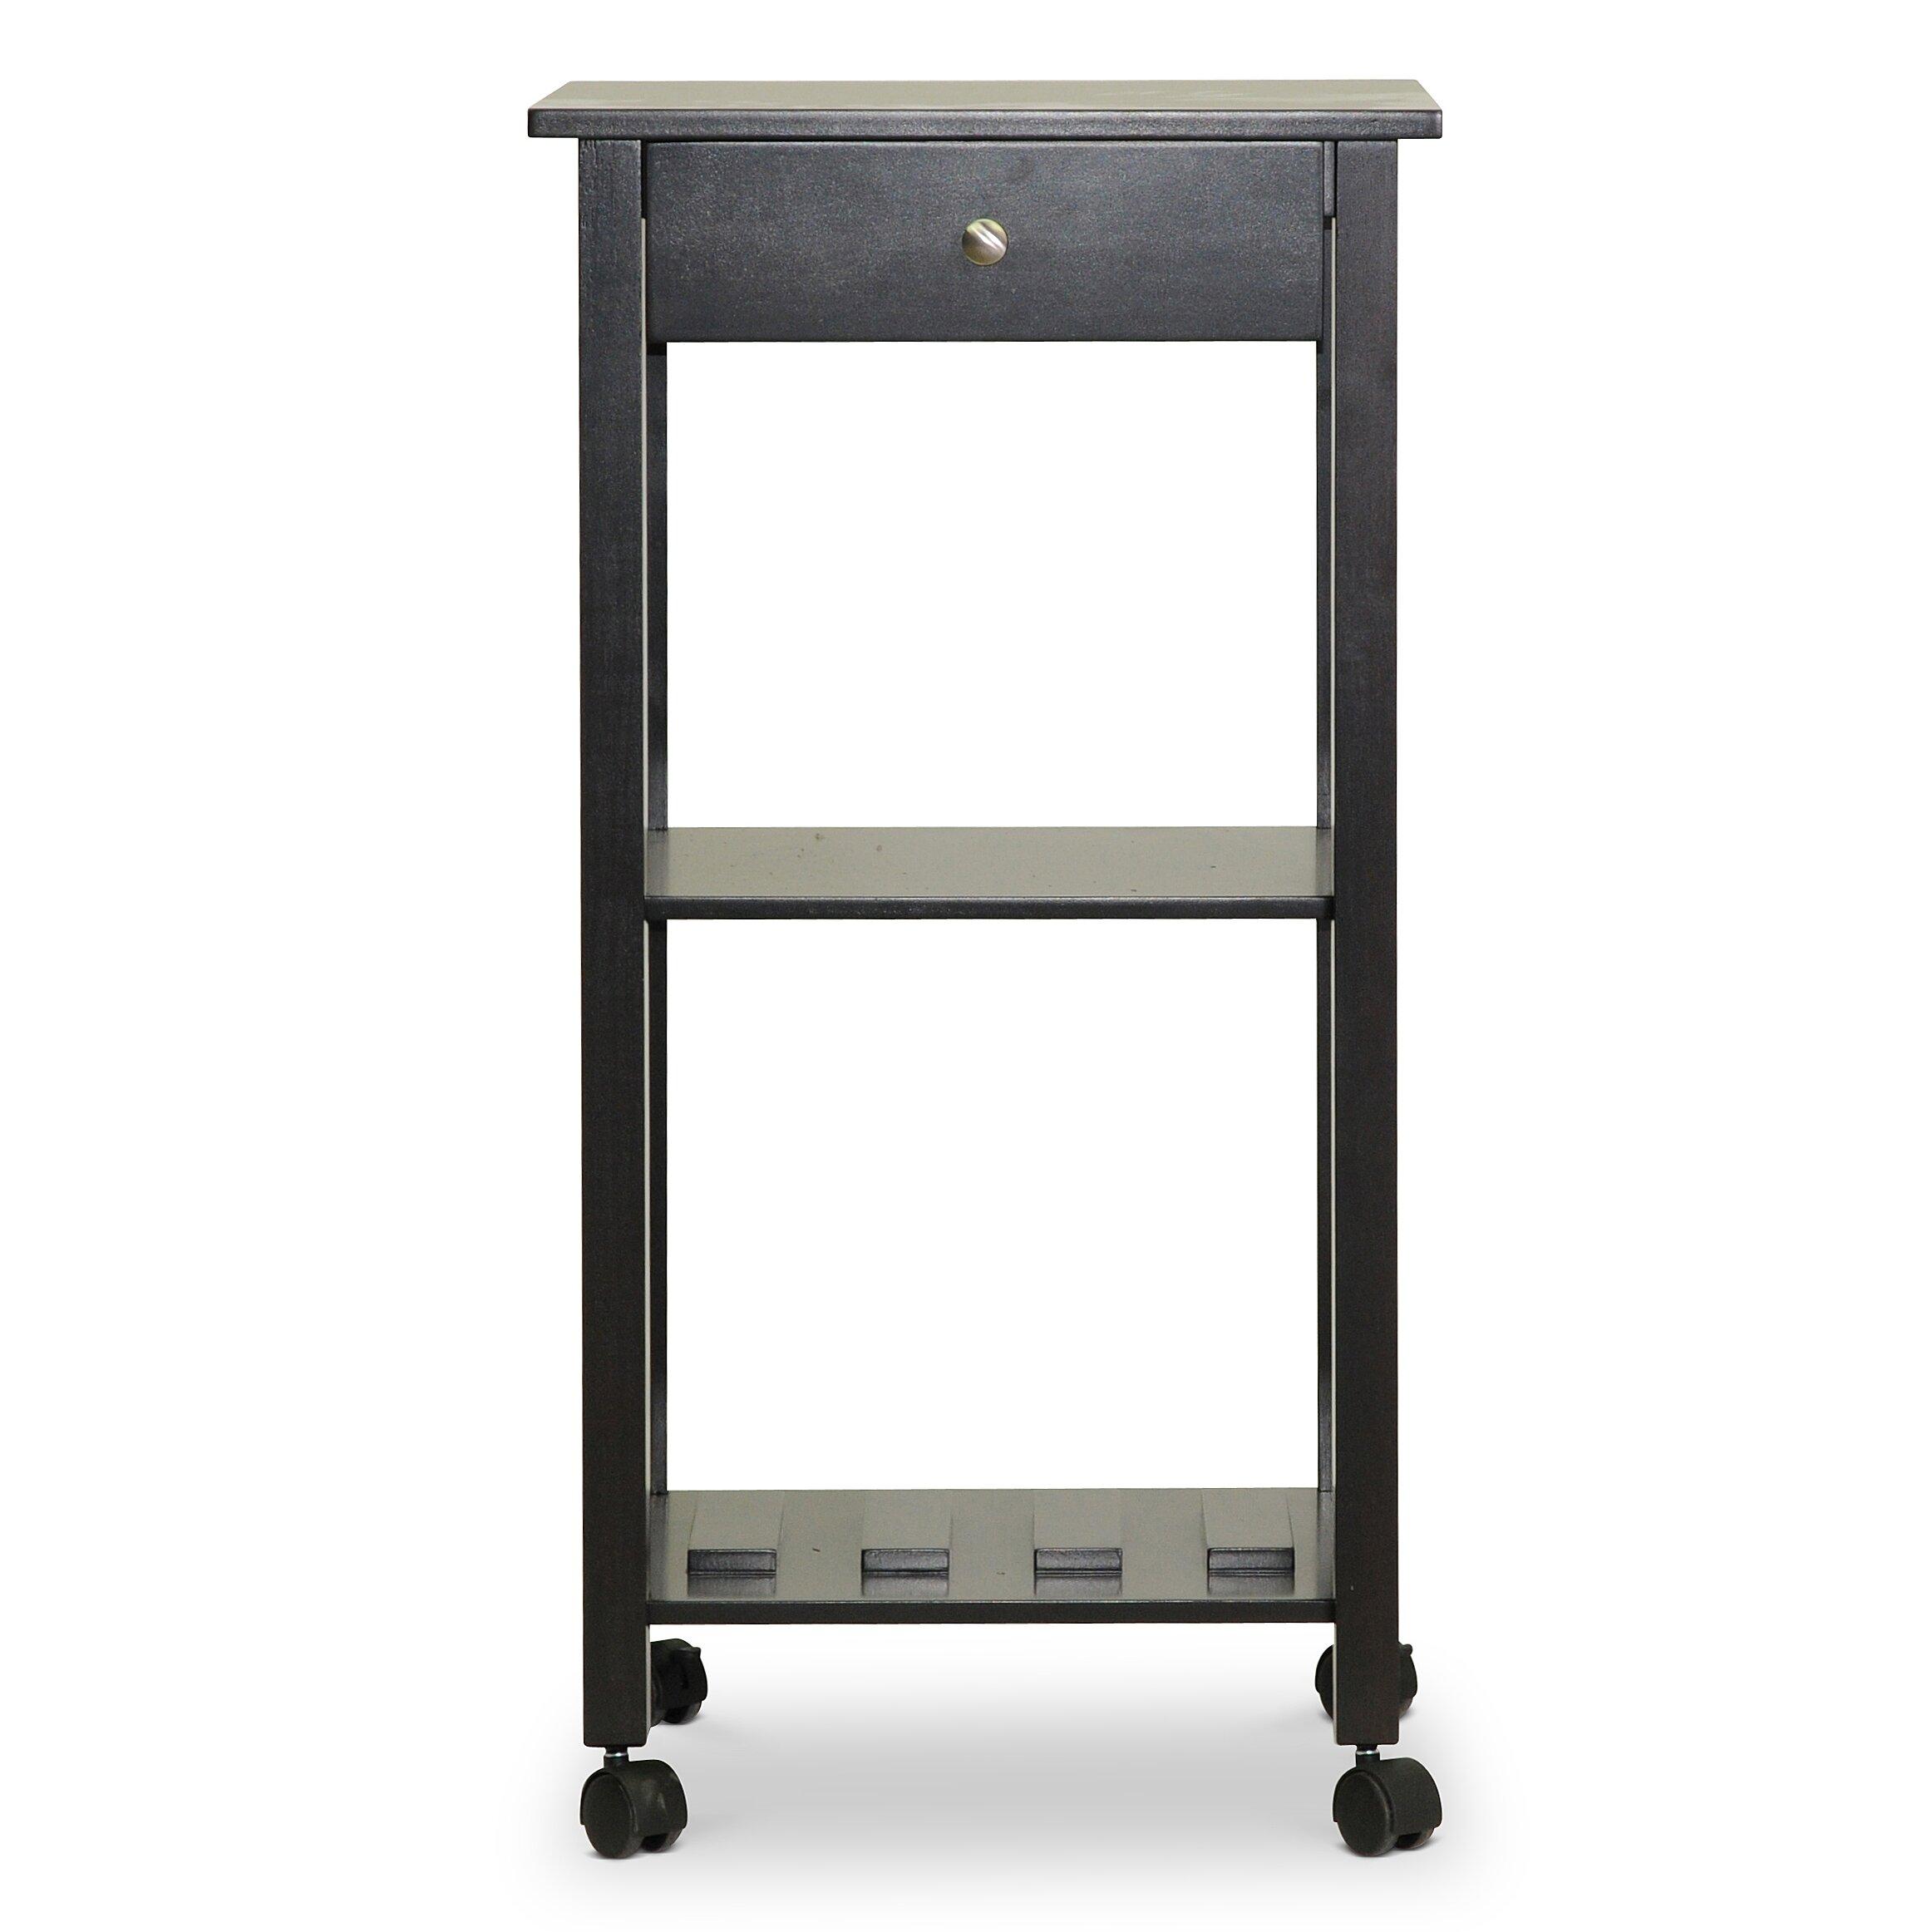 Wholesale Interiors Bradford Serving Cart Reviews: Wholesale Interiors Baxton Studio Coppinger Serving Cart